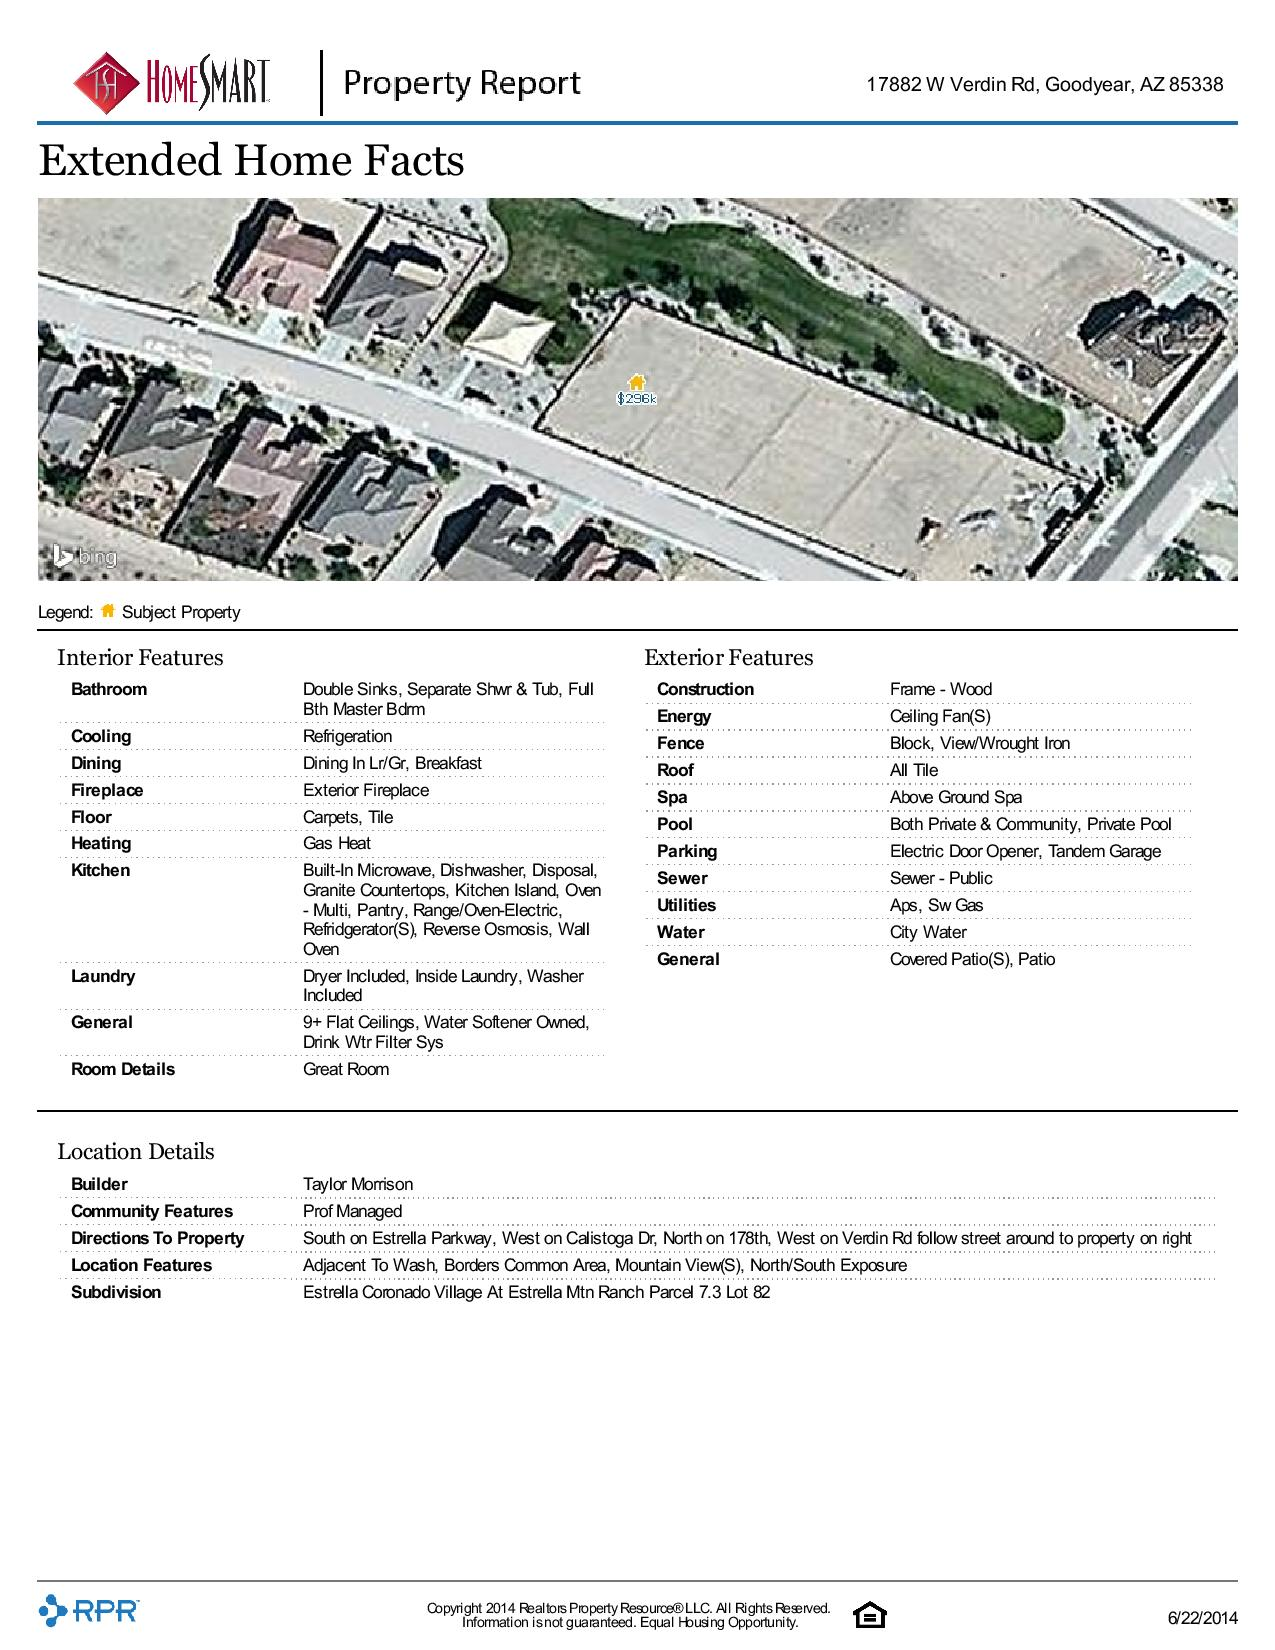 17882-W-Verdin-Rd-Goodyear-AZ-85338-page-004